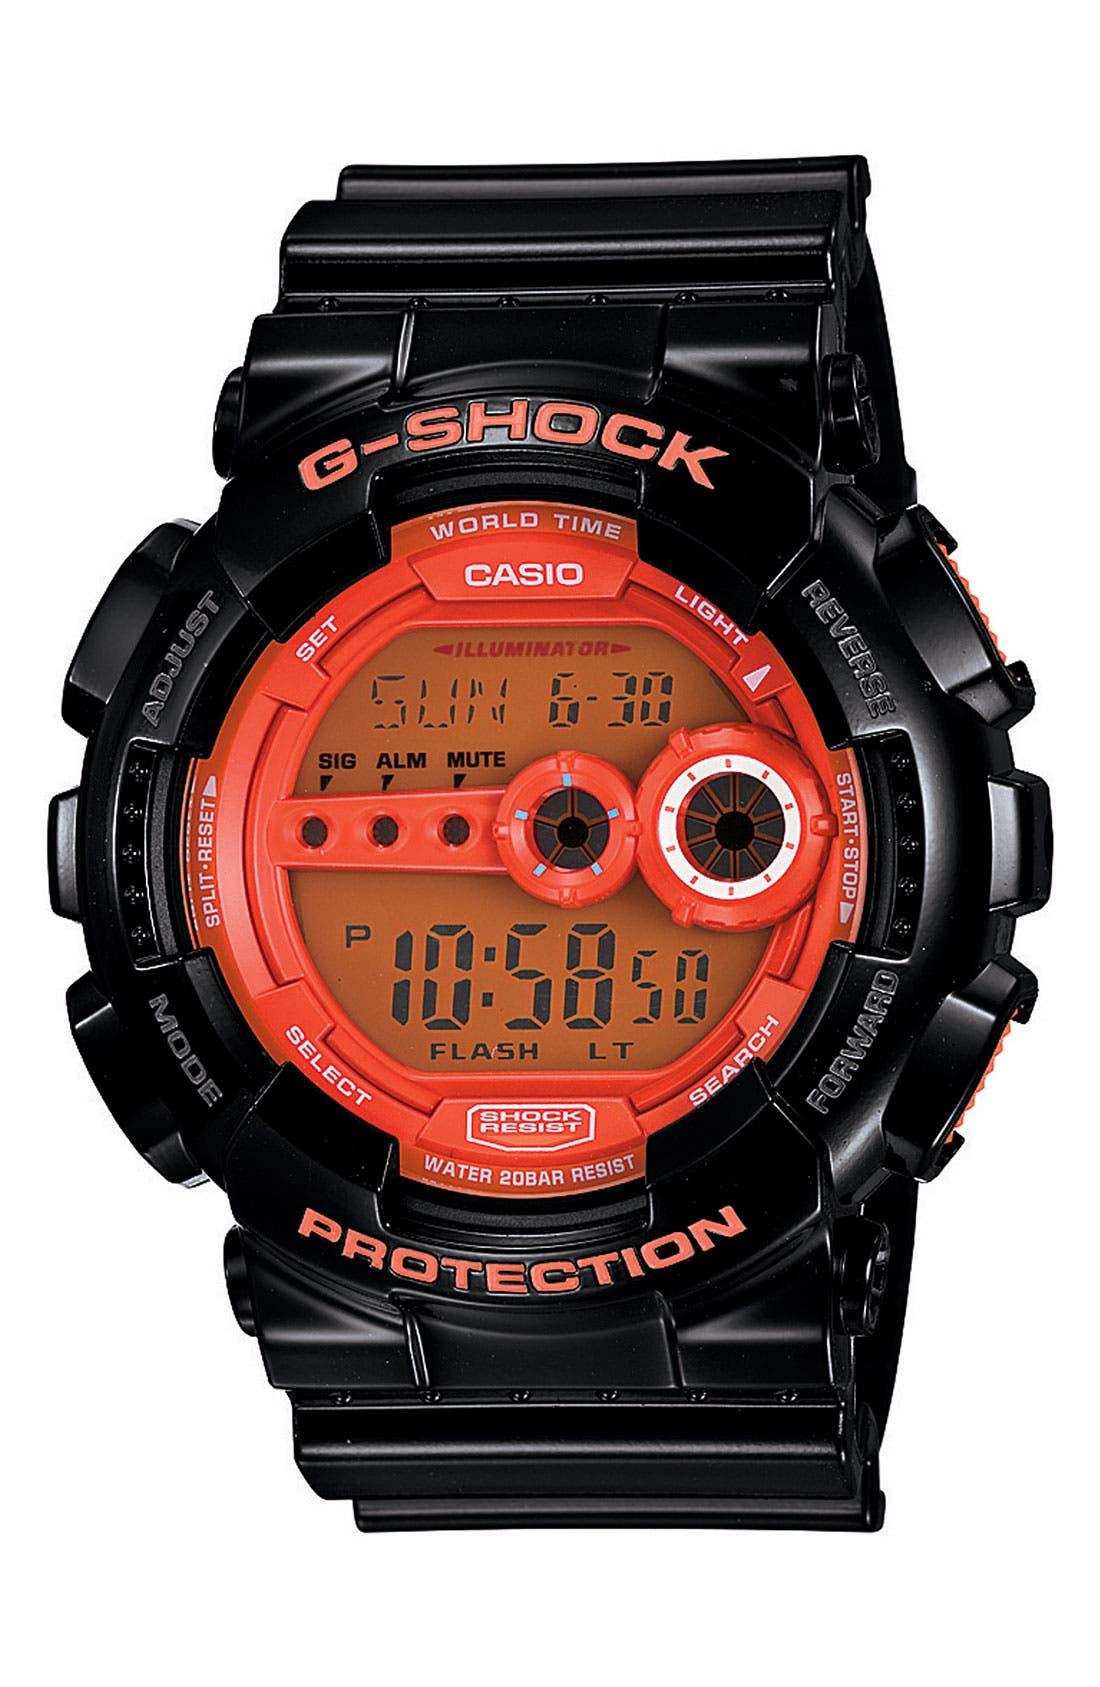 Main Image - G-Shock 'Super Luminosity' Digital Watch, 48mm